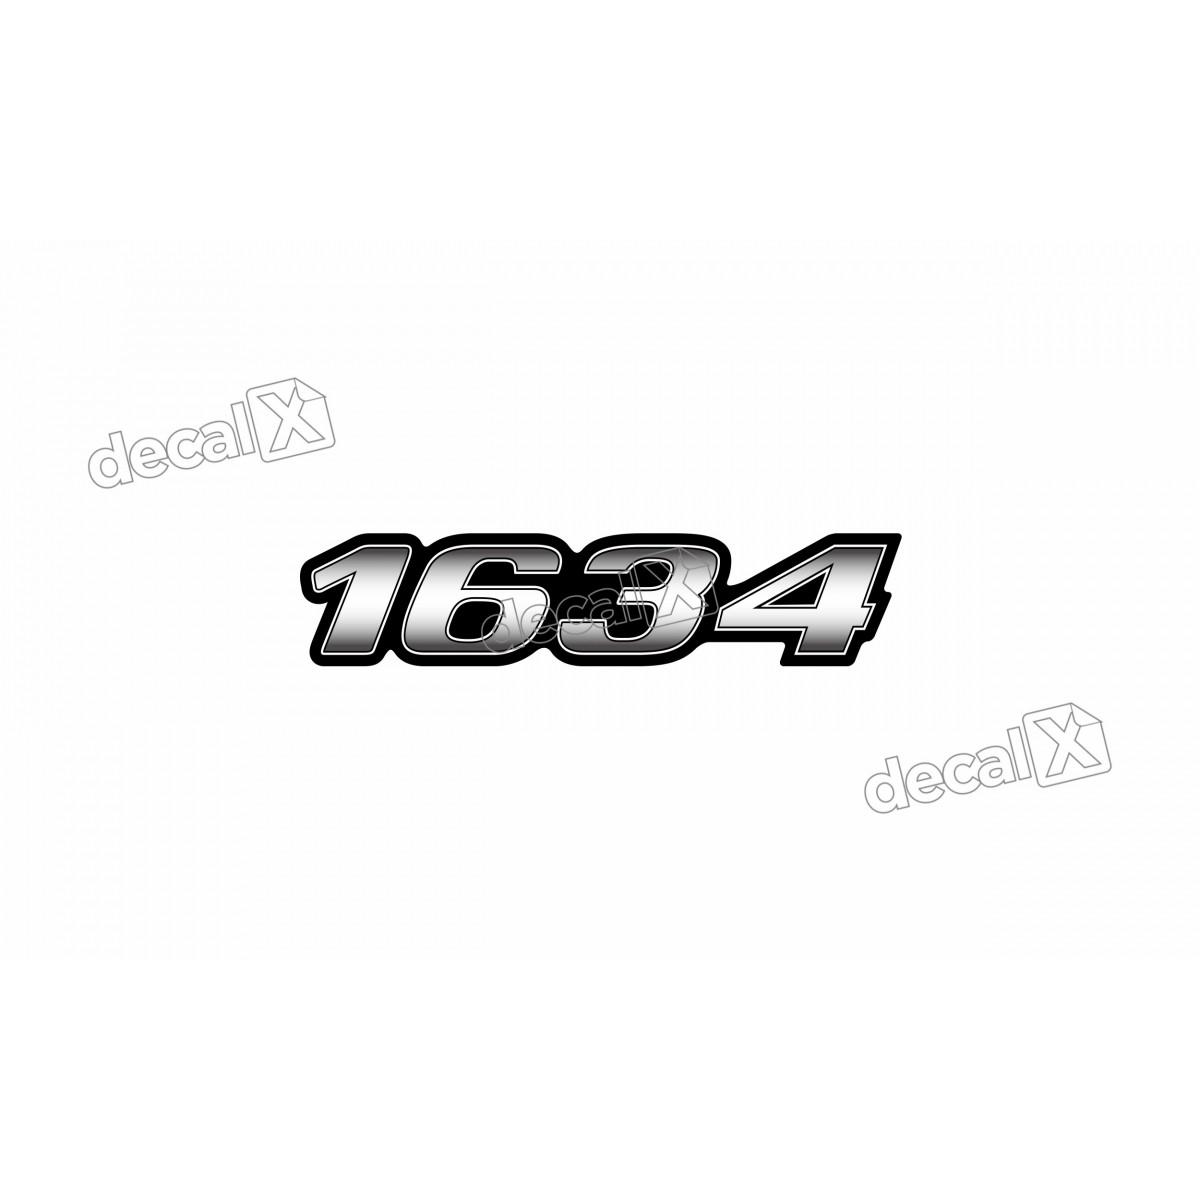 Adesivo Emblema Resinado Mercedes 1634 Cm55 Decalx